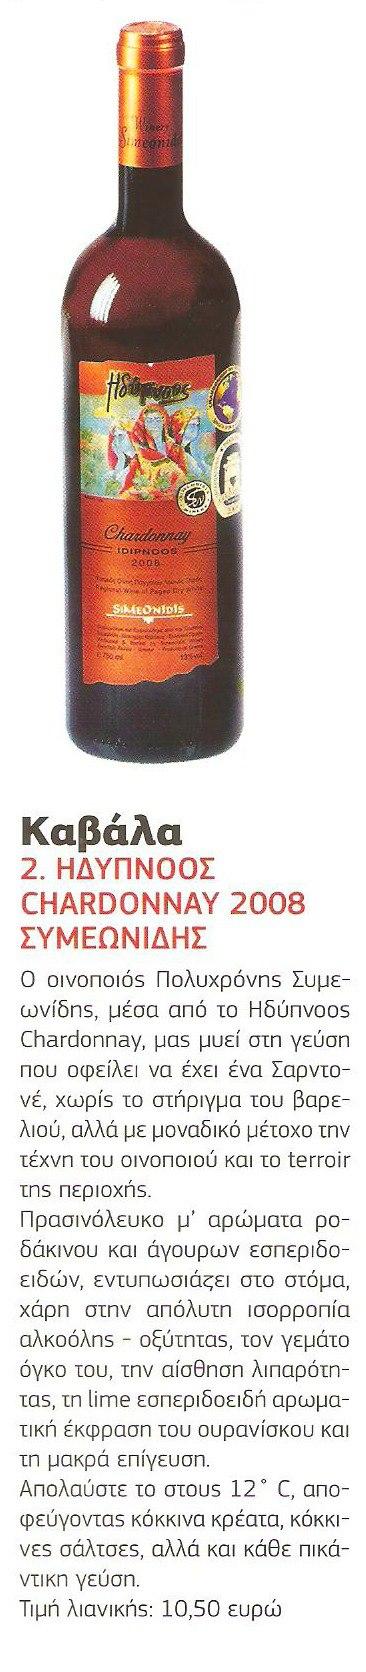 Lichoudies Nostimies by Ilias Mamalakis Magazine, Issue 1, November 2009